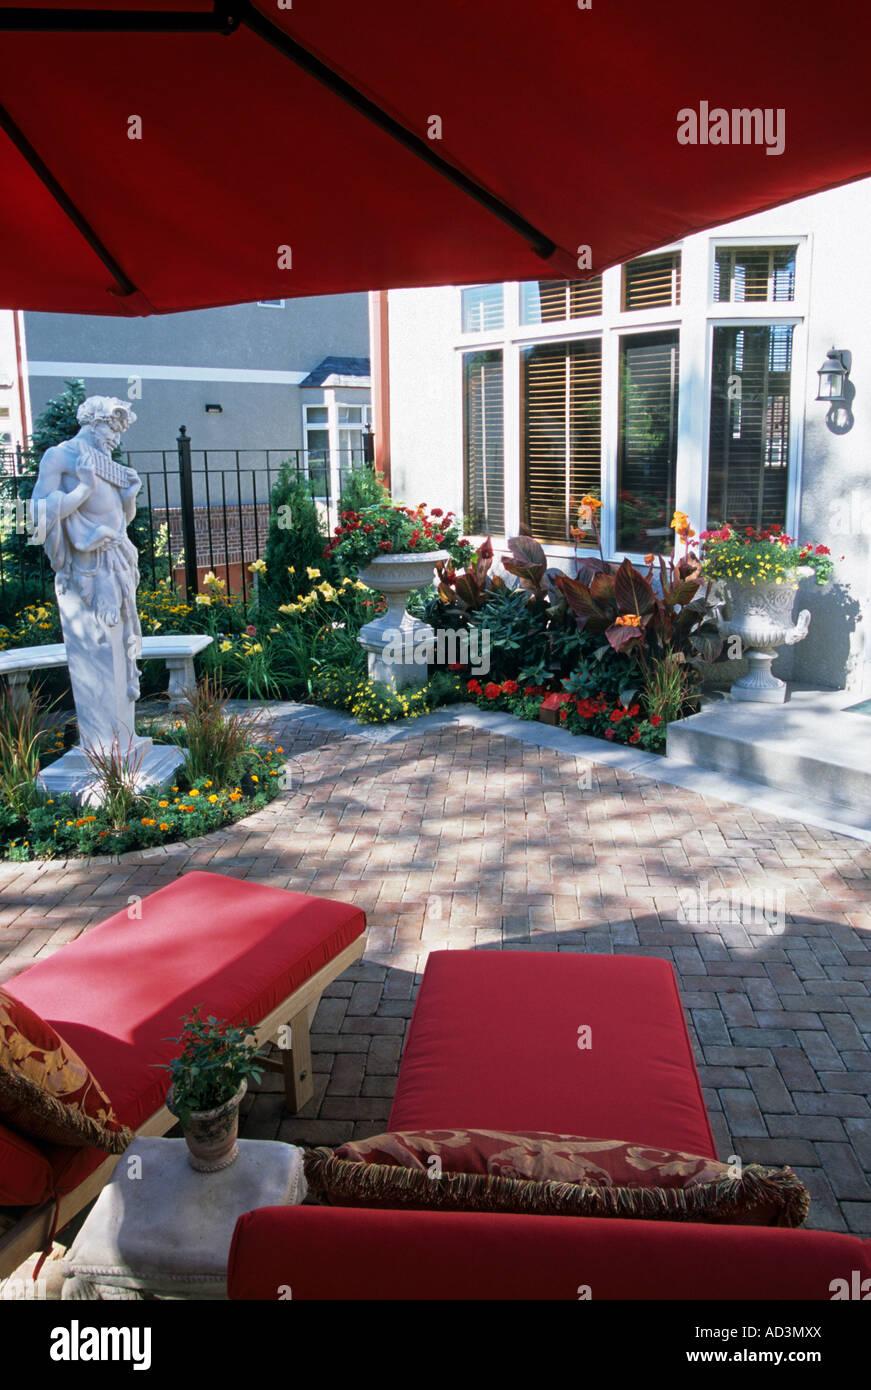 MINNEAPOLIS, MINNESOTA TOWNHOME PATIO GARDEN WITH STATUE OF PAN TERME,  HADDENSTONE BENCH, CANNA